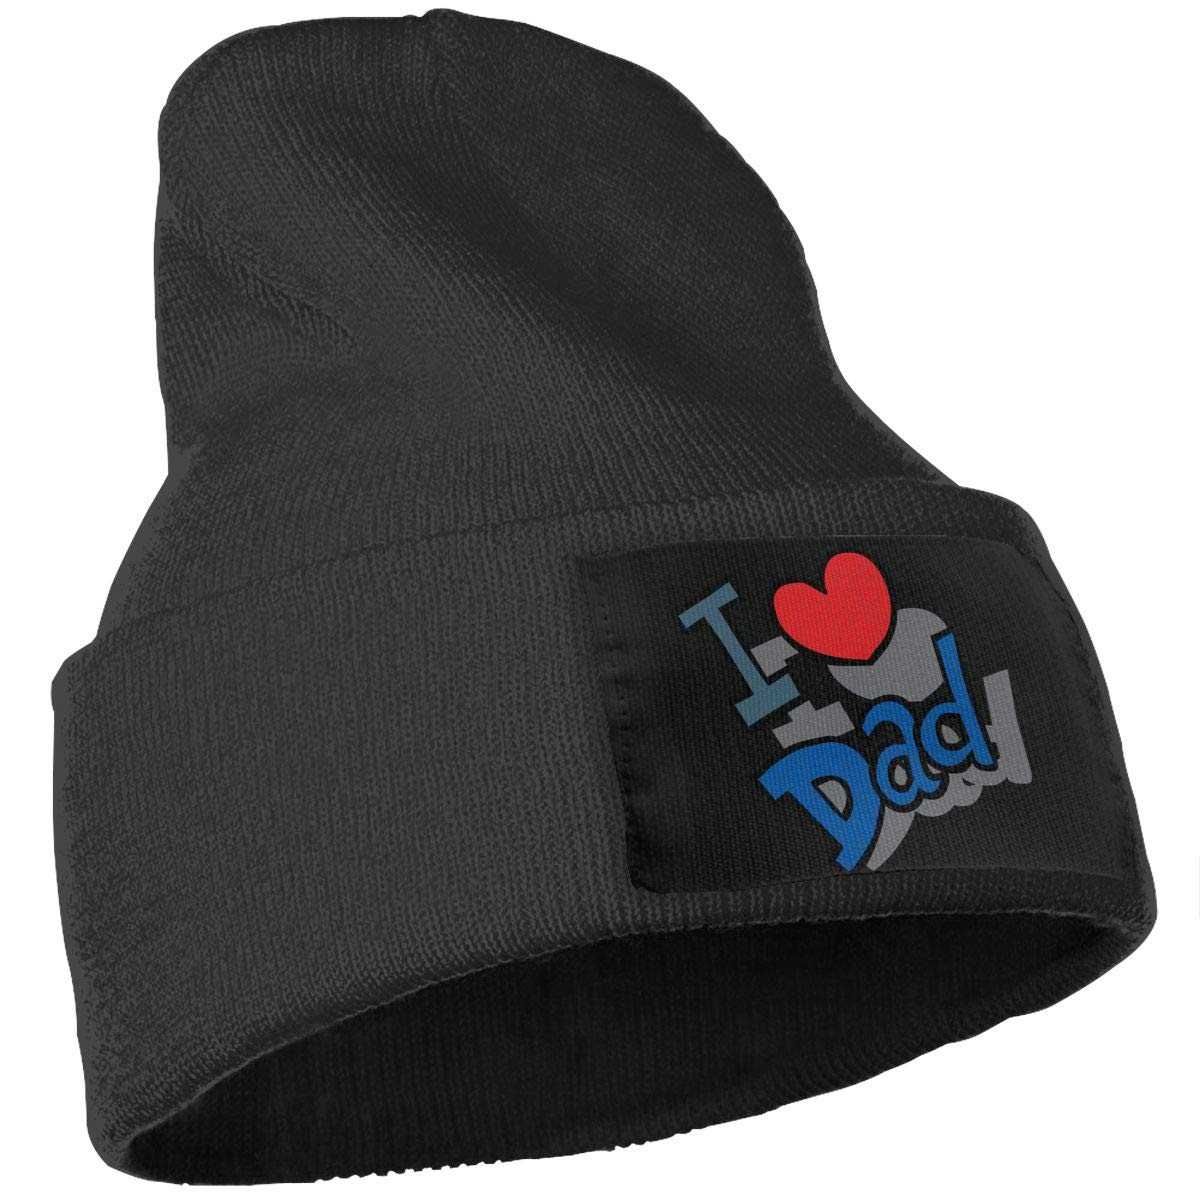 I Love My Father Warm Winter Hat Knit Beanie Skull Cap Cuff Beanie Hat Winter Hats for Men /& Women